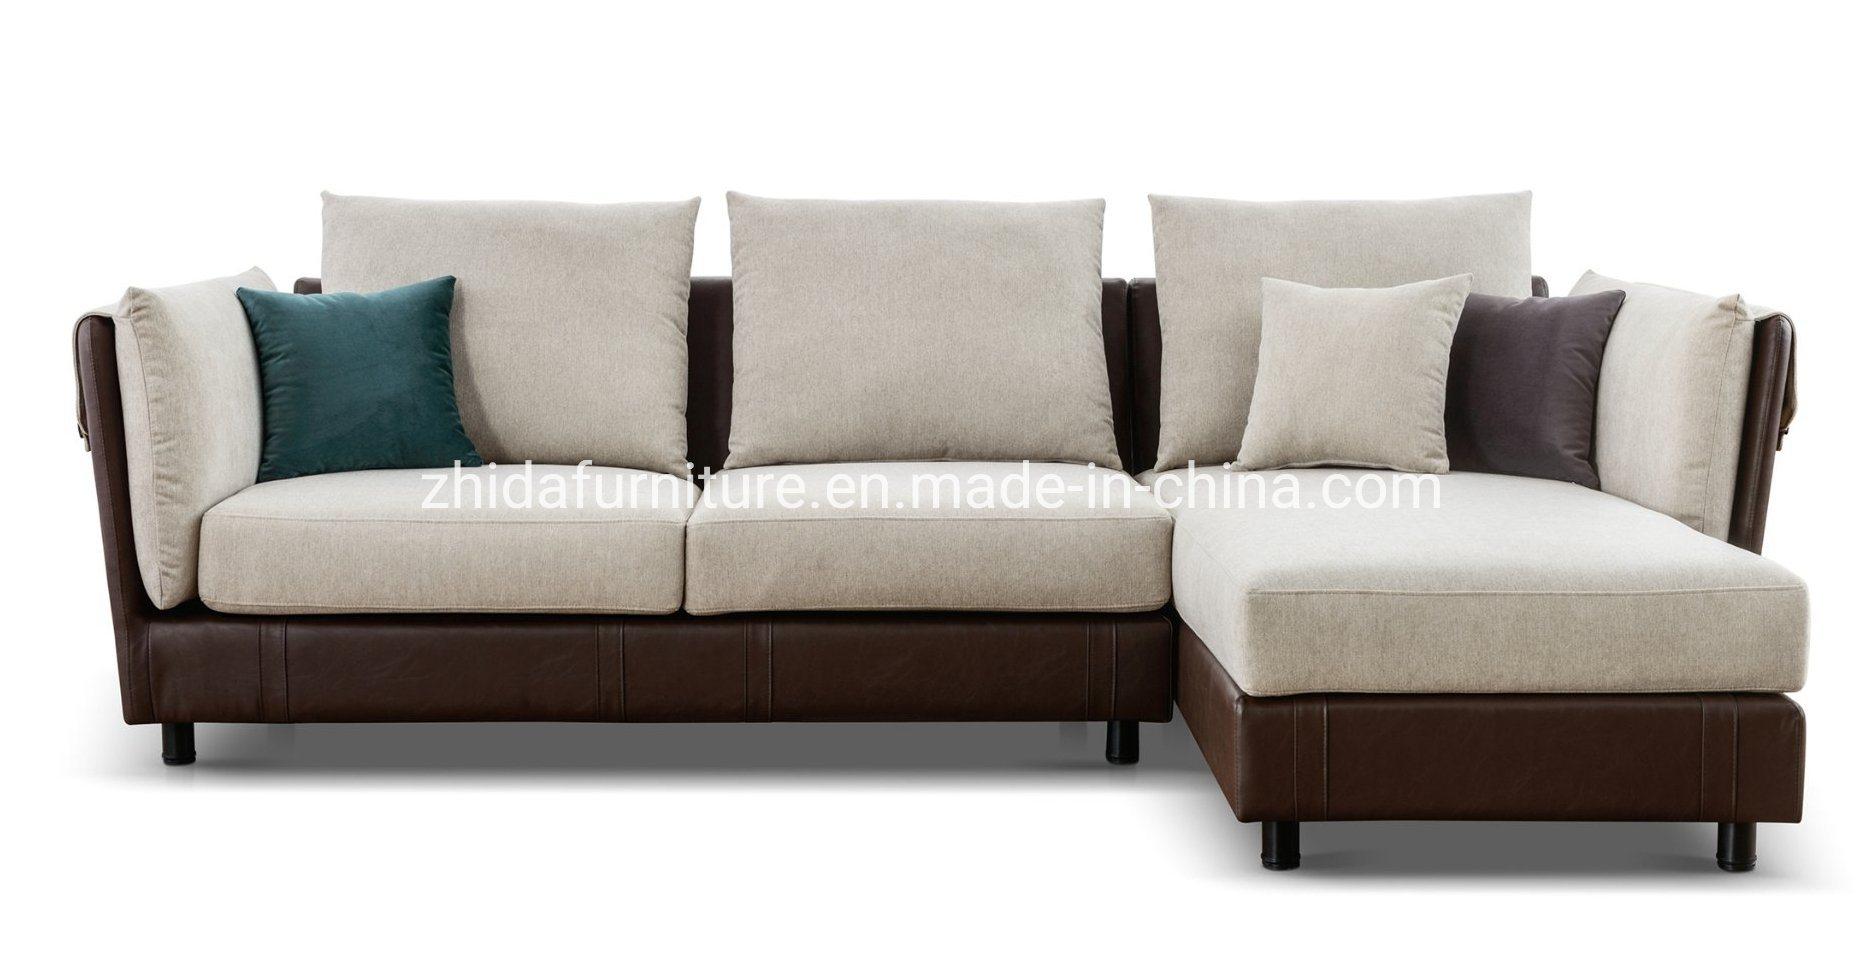 China Modern Furniture Leather Fabric